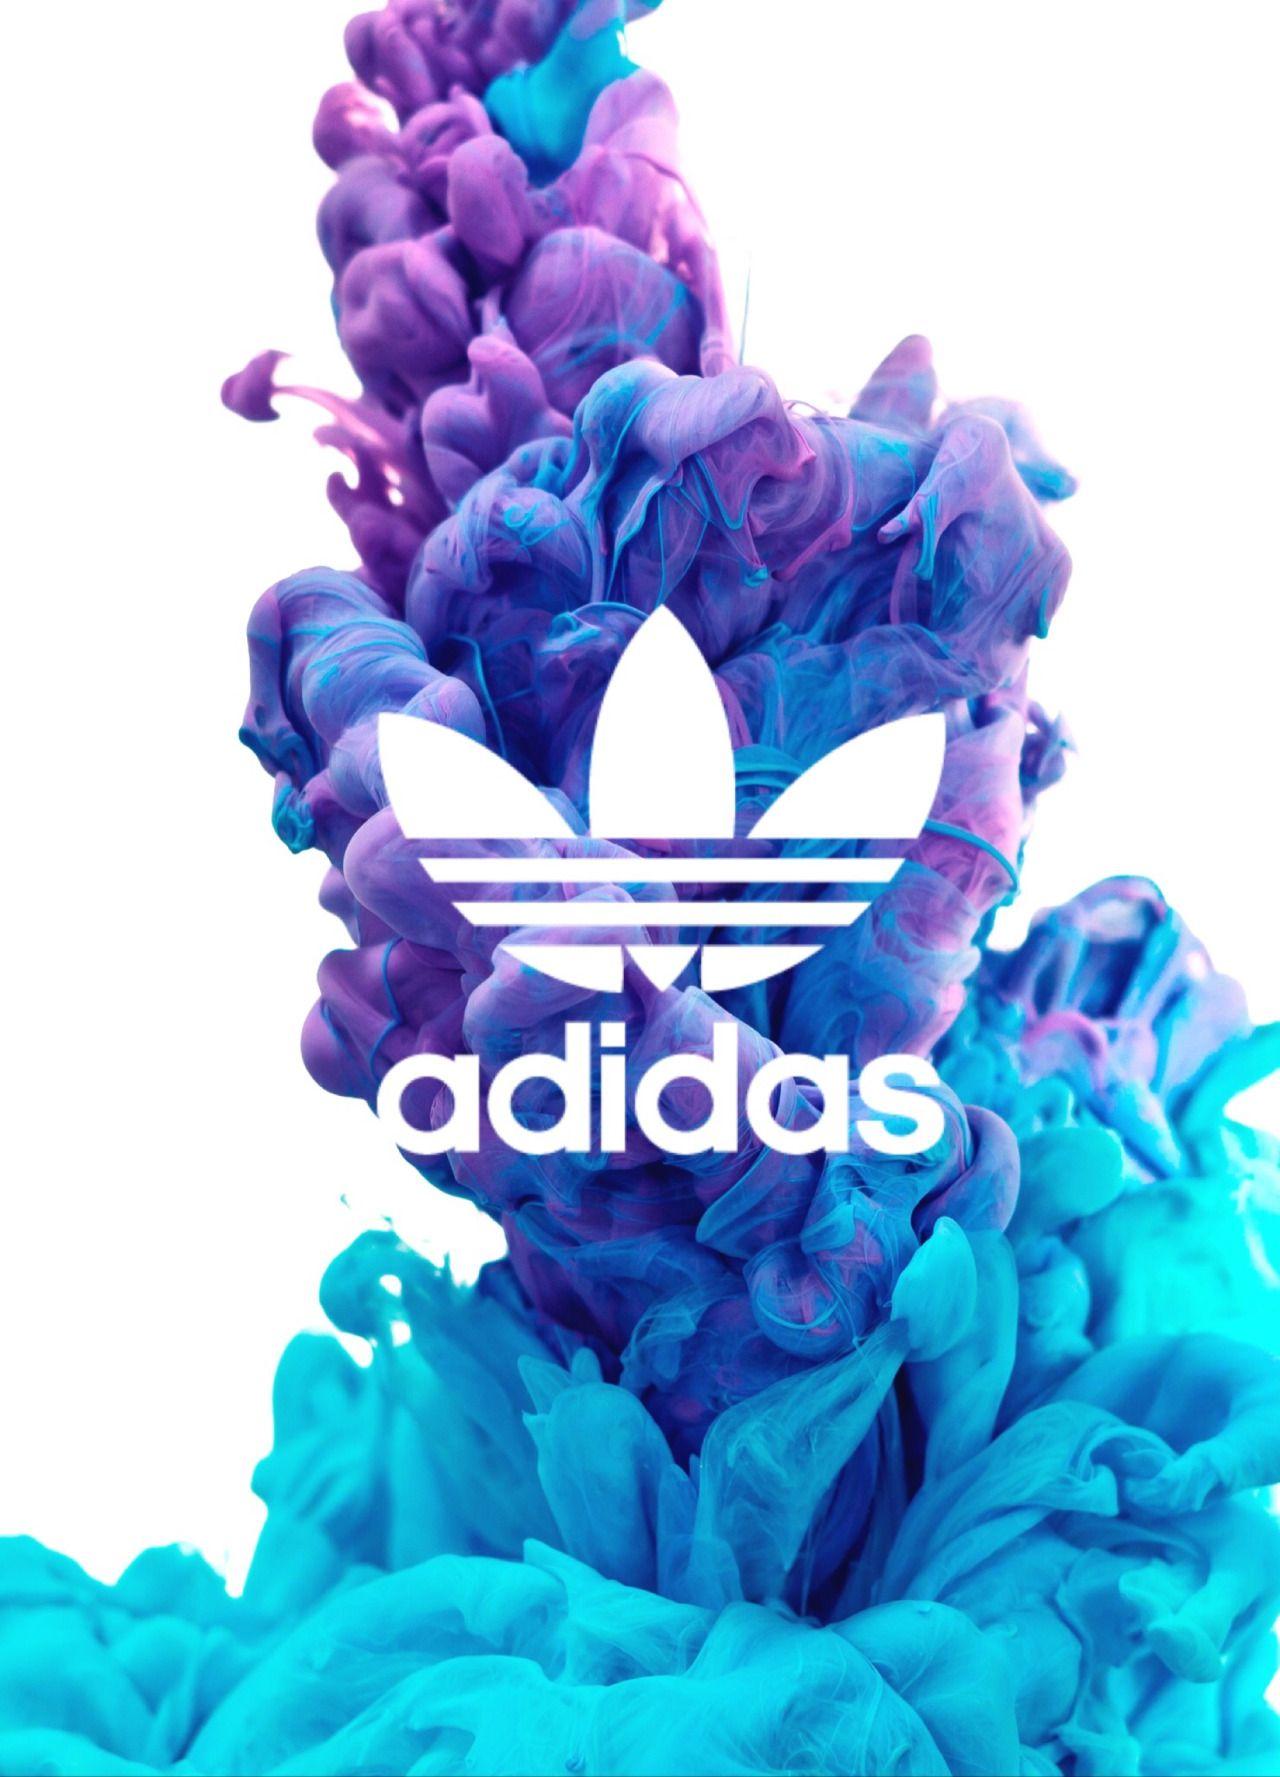 tumblr adidas